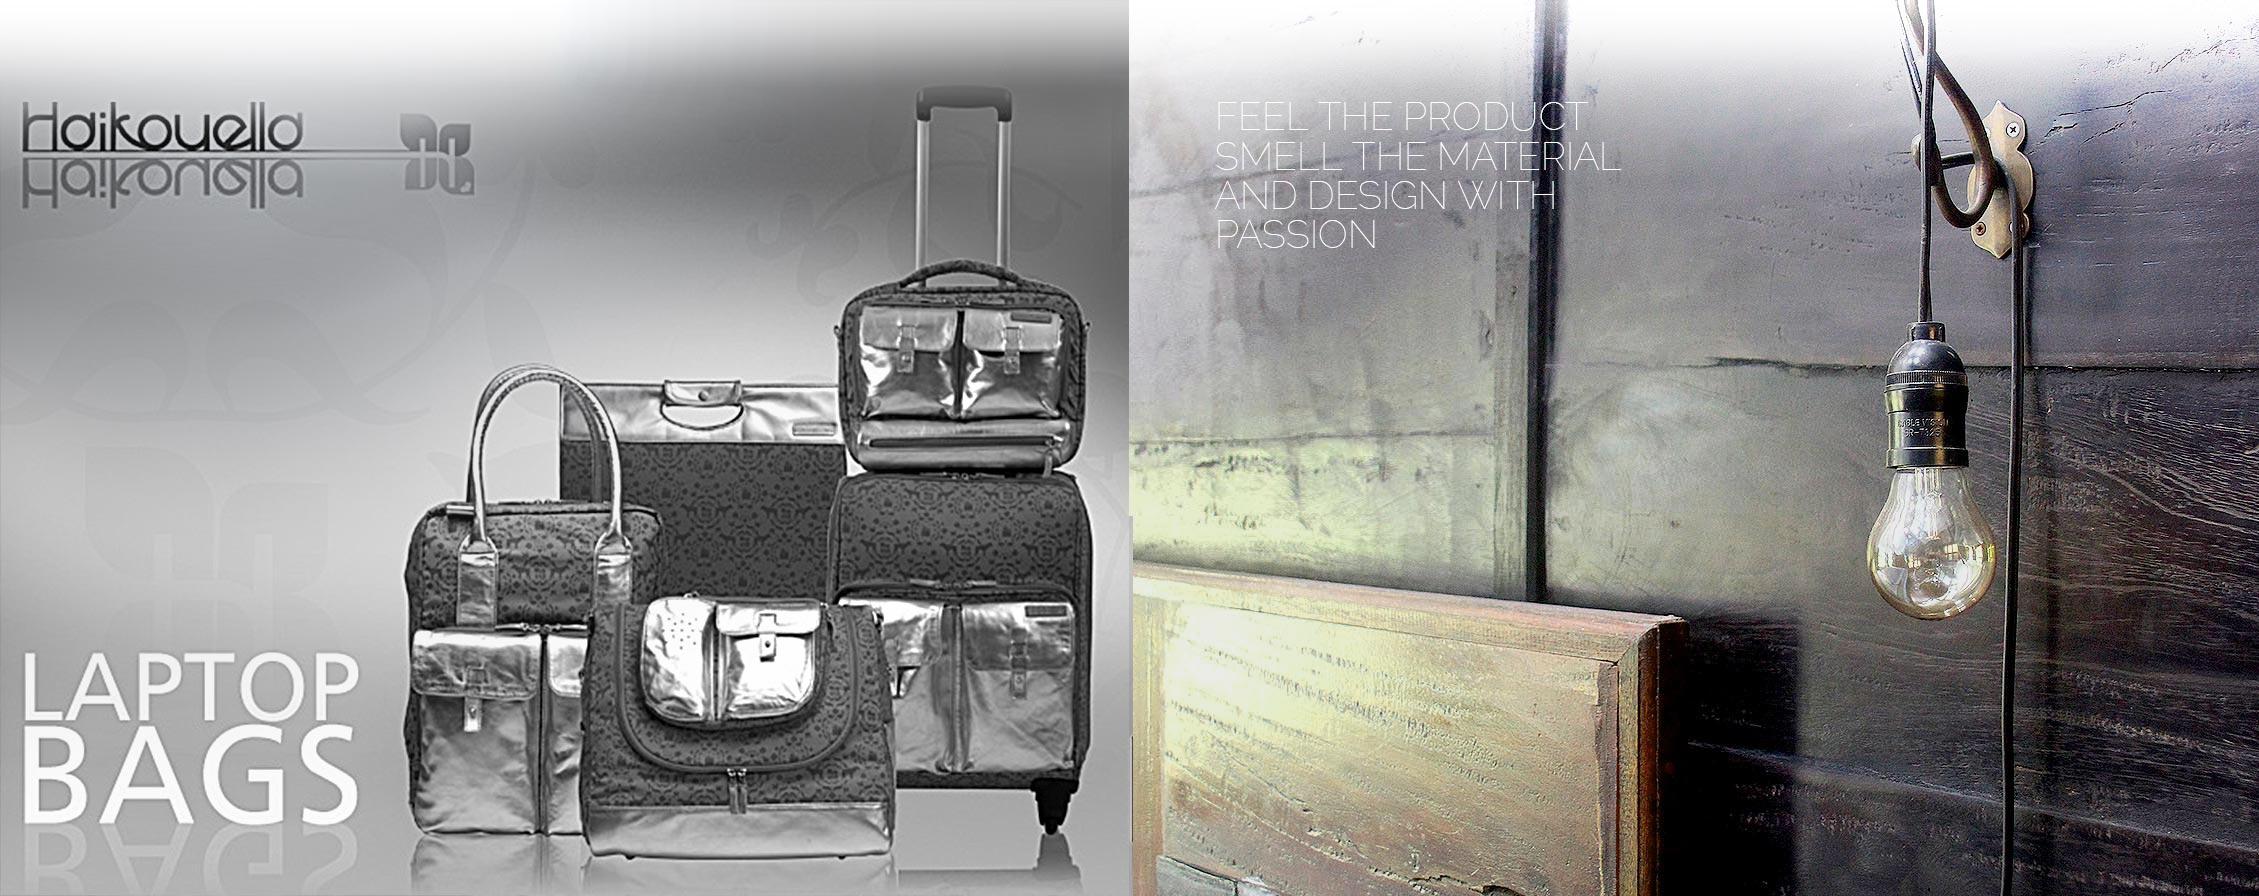 produkt design boards bags accessories muenchen agentur v5